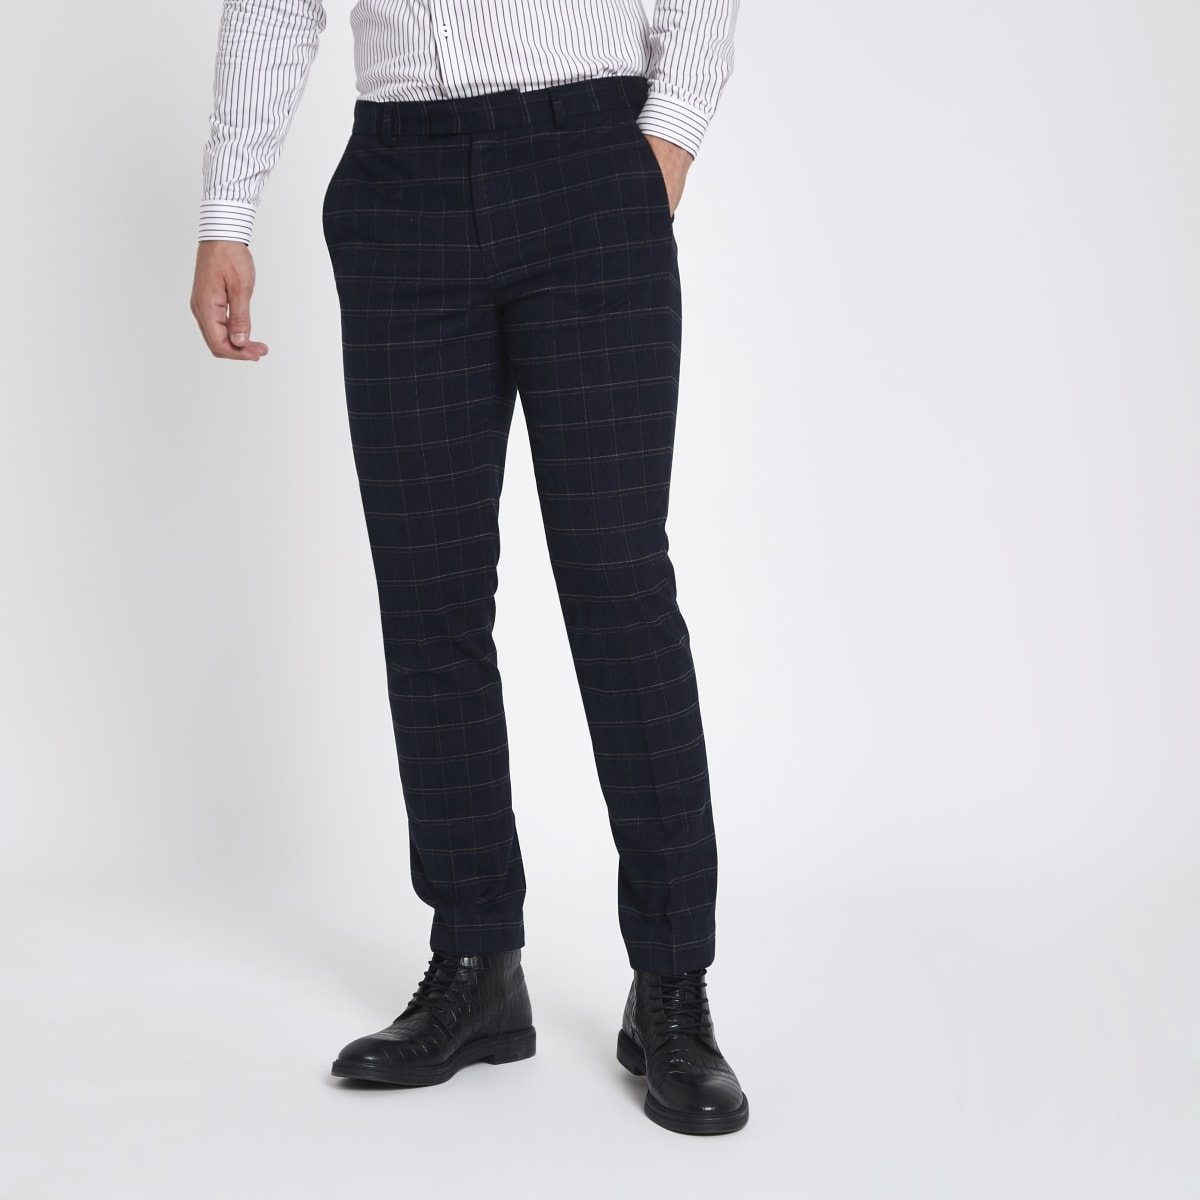 Marineblauwe skinny pantalon met groot ruitmotief